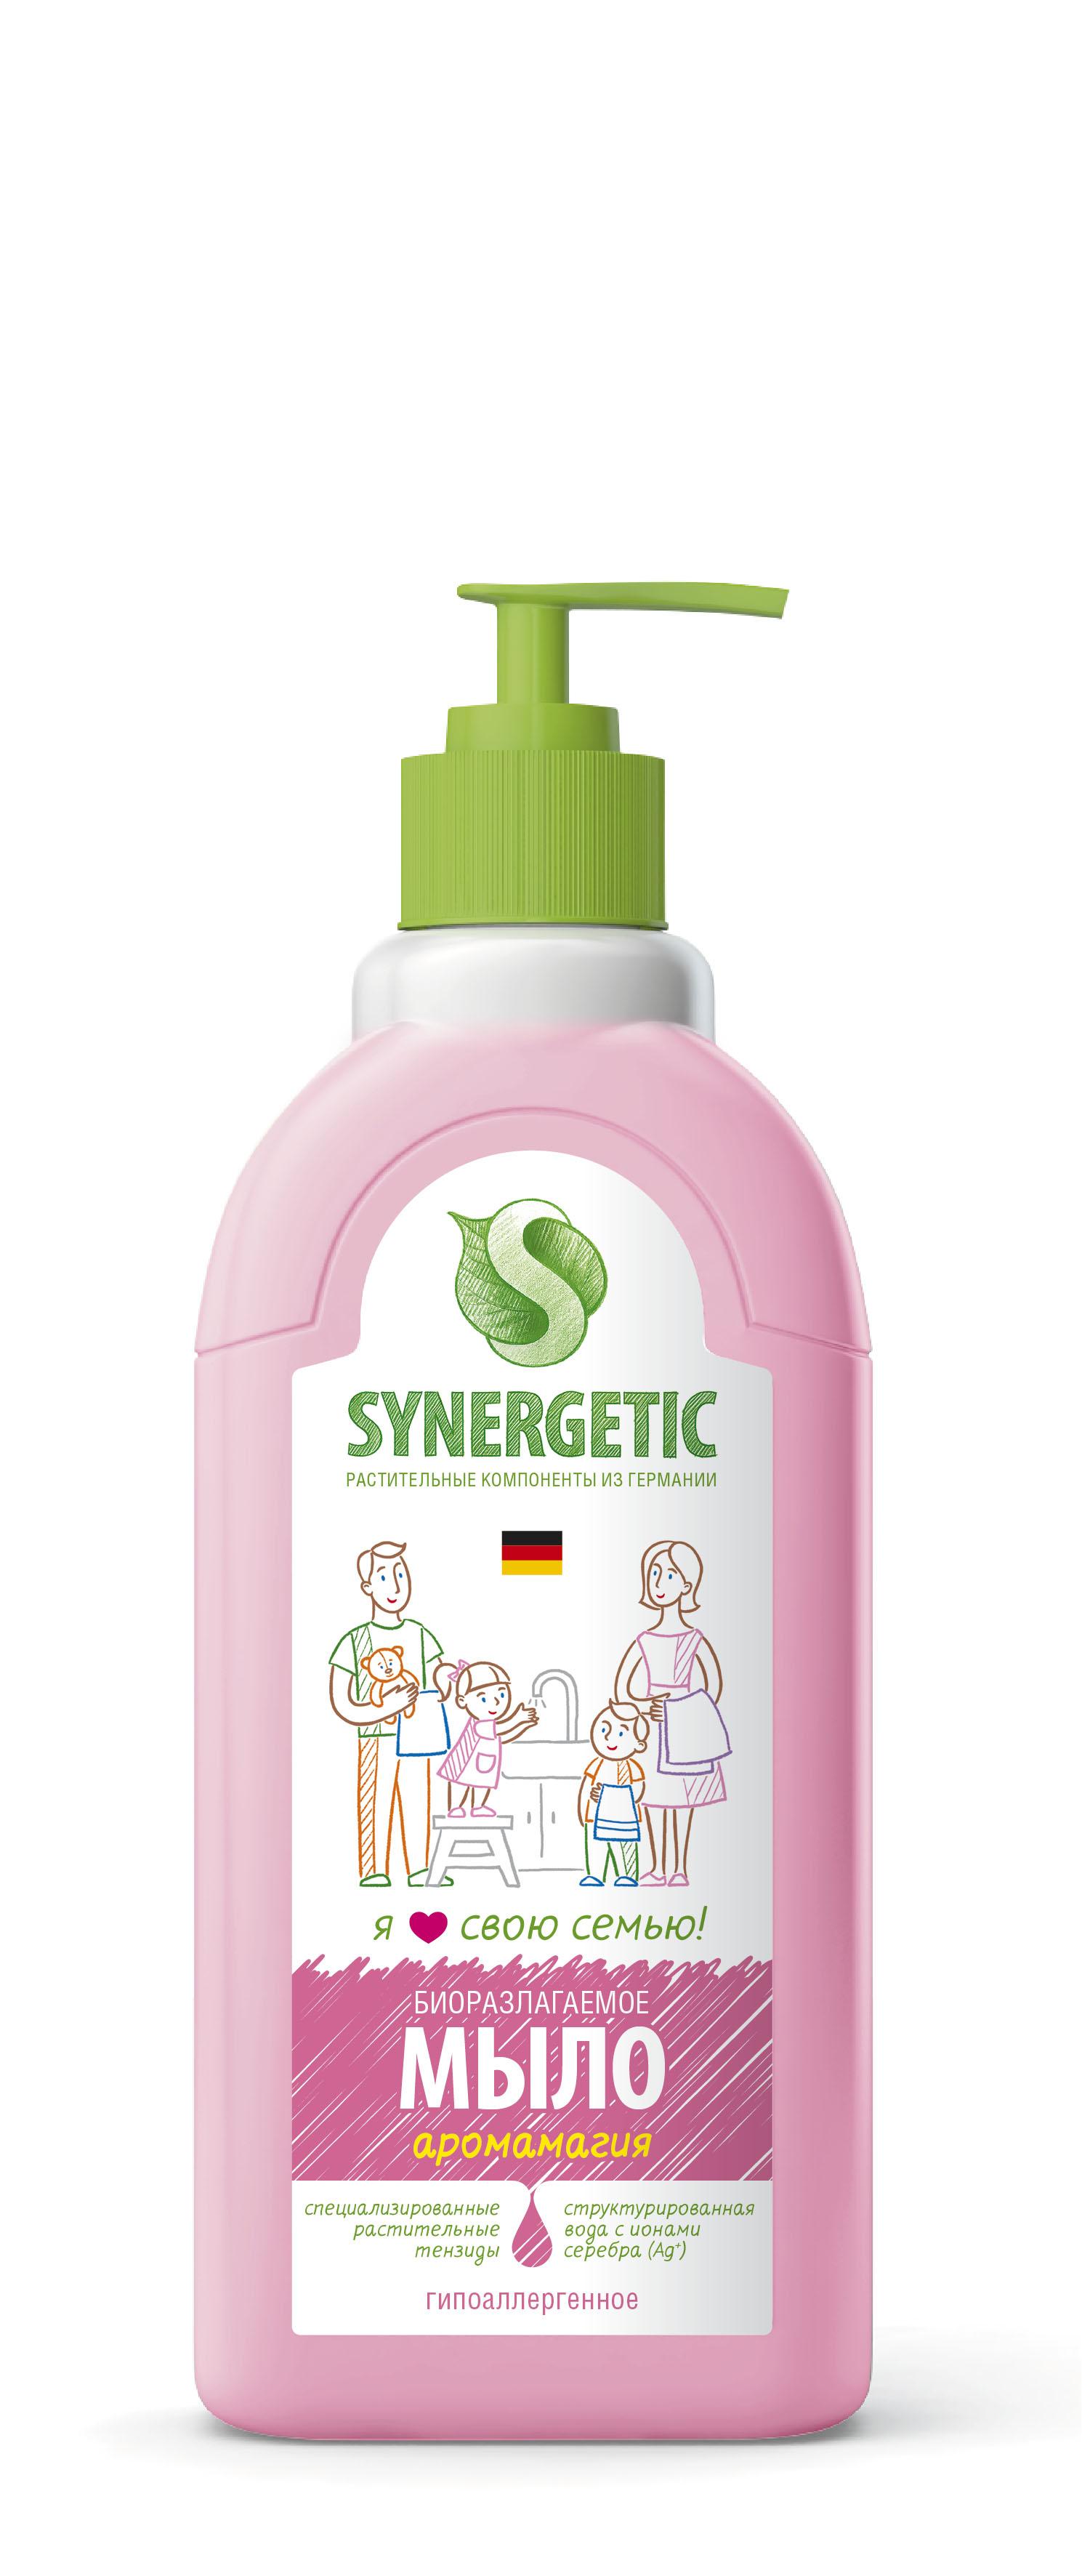 Жидкое мыло Synergetic Аромамагия 0,5 л жидкое мыло synergetic аромамагия 0 5 л